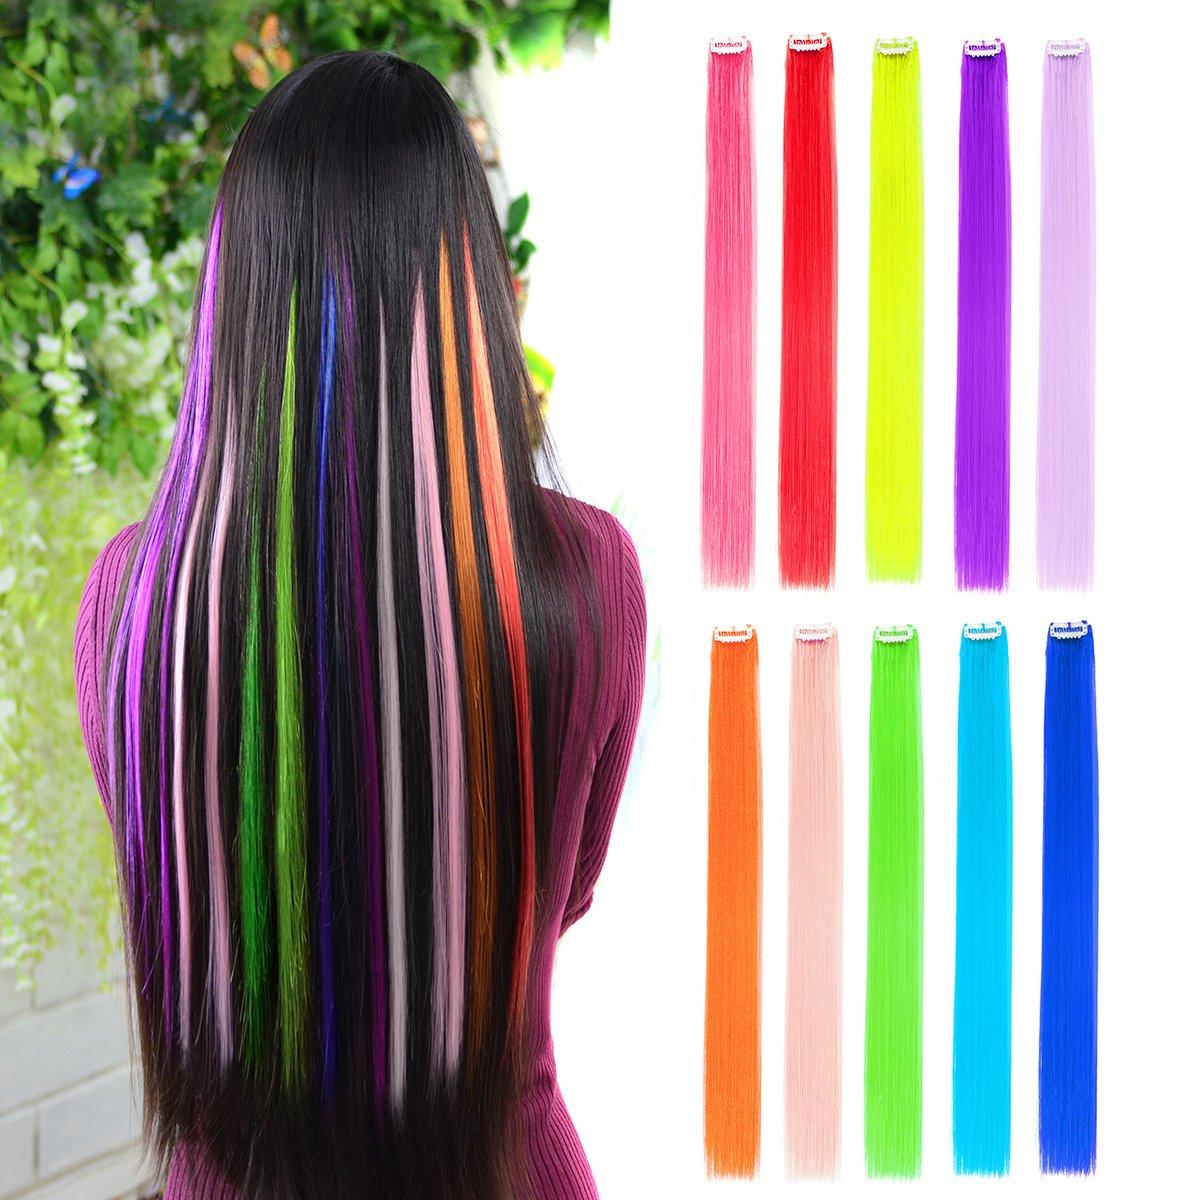 d7c4377857f6 Amazon.com   10pcs Colored Clip in Hair Extensions 22